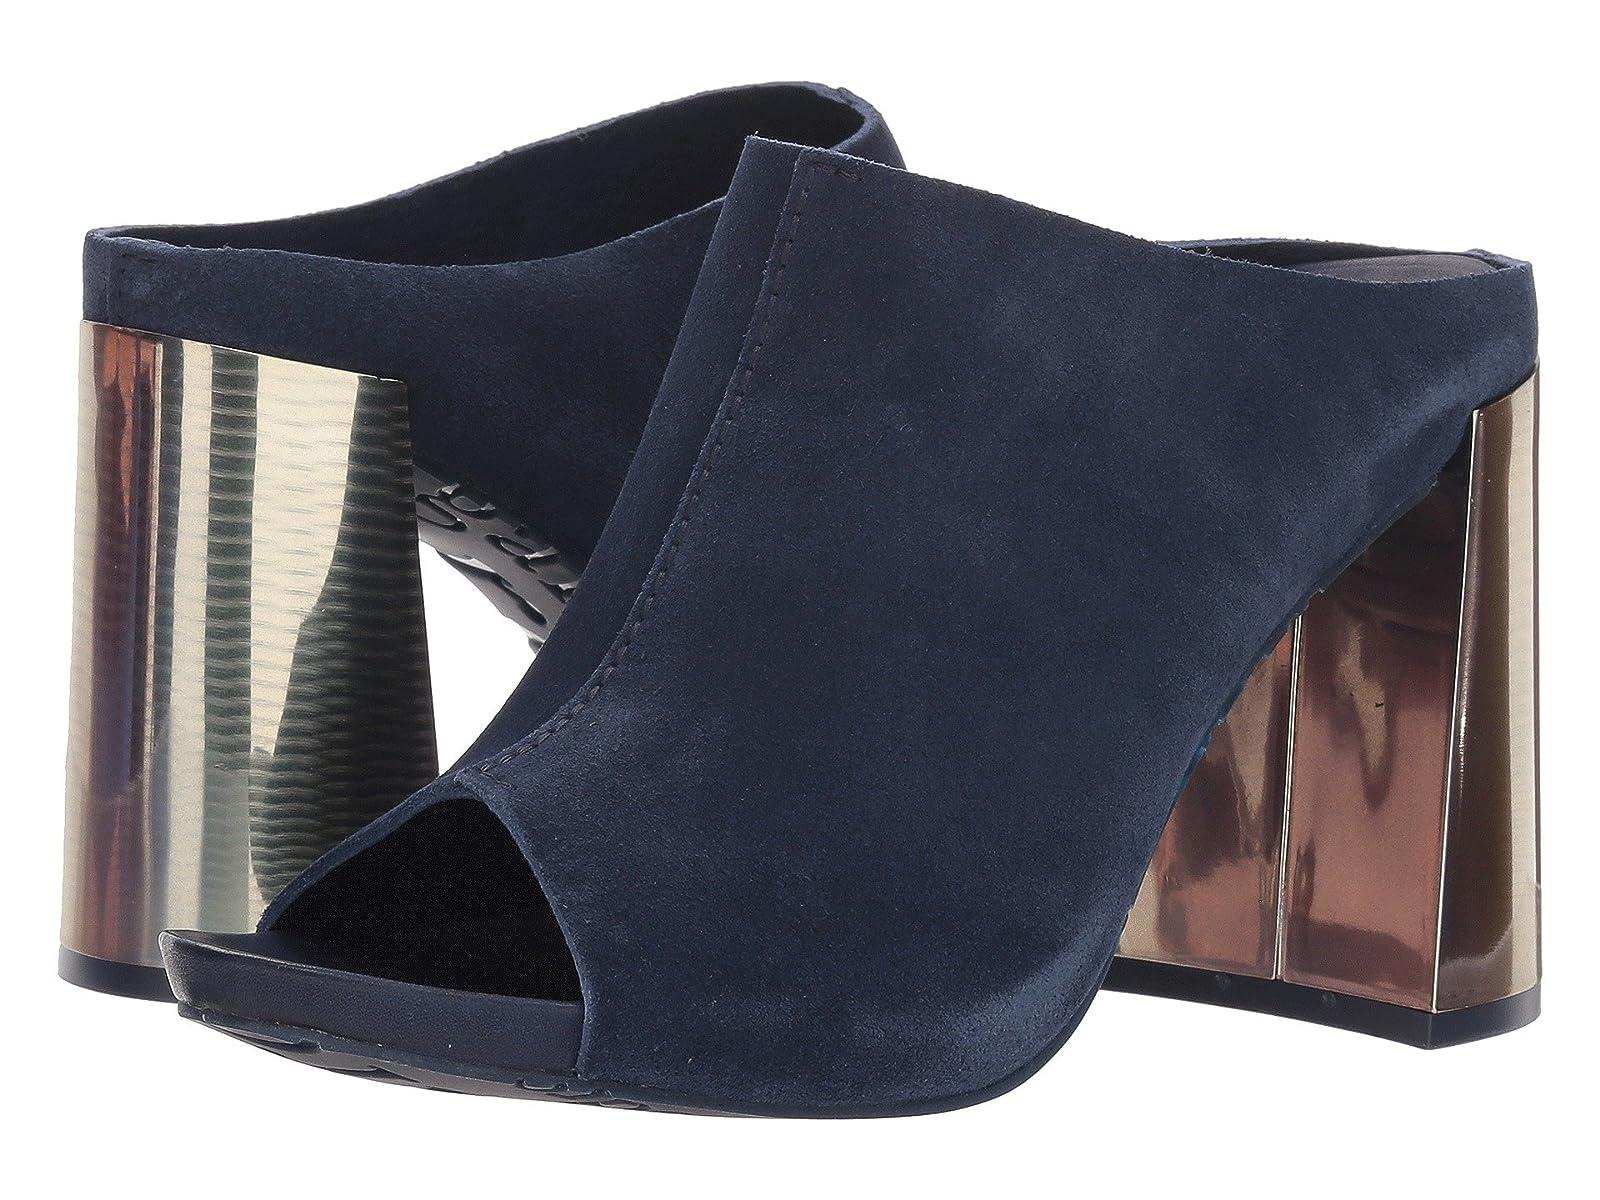 Pedro Garcia YavelAtmospheric grades have affordable shoes